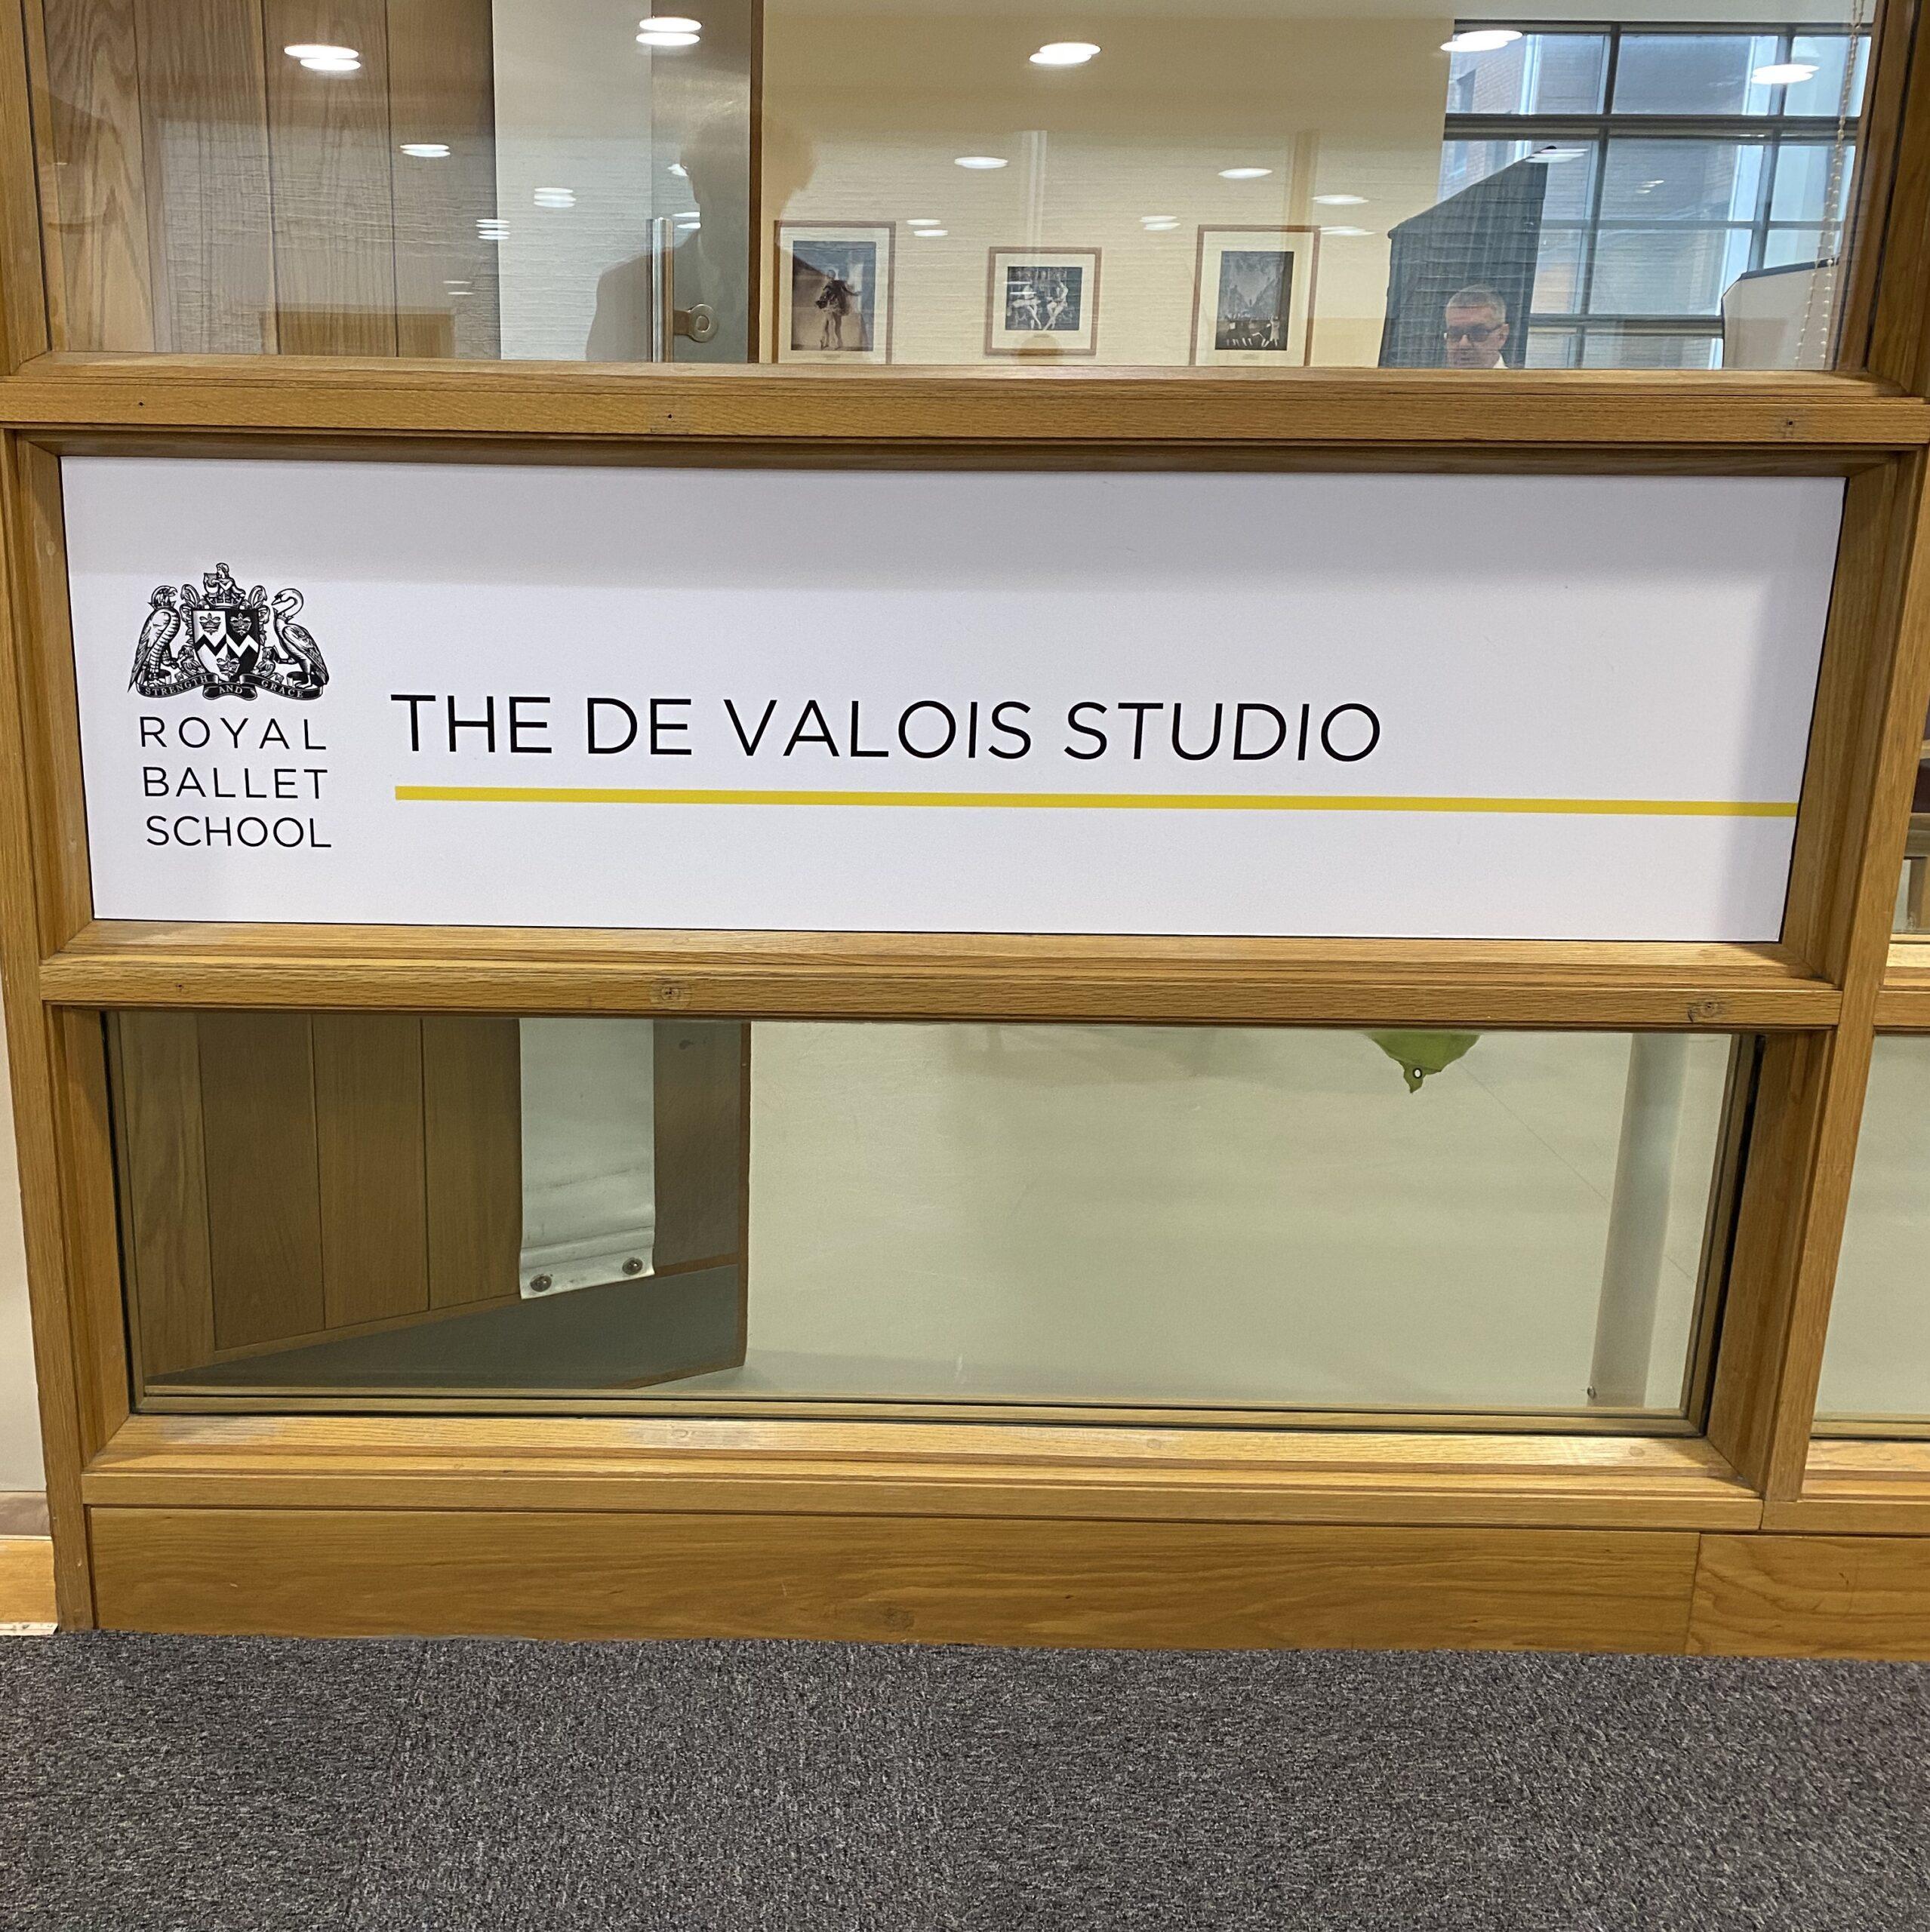 Royal Ballet School De Valois Studio